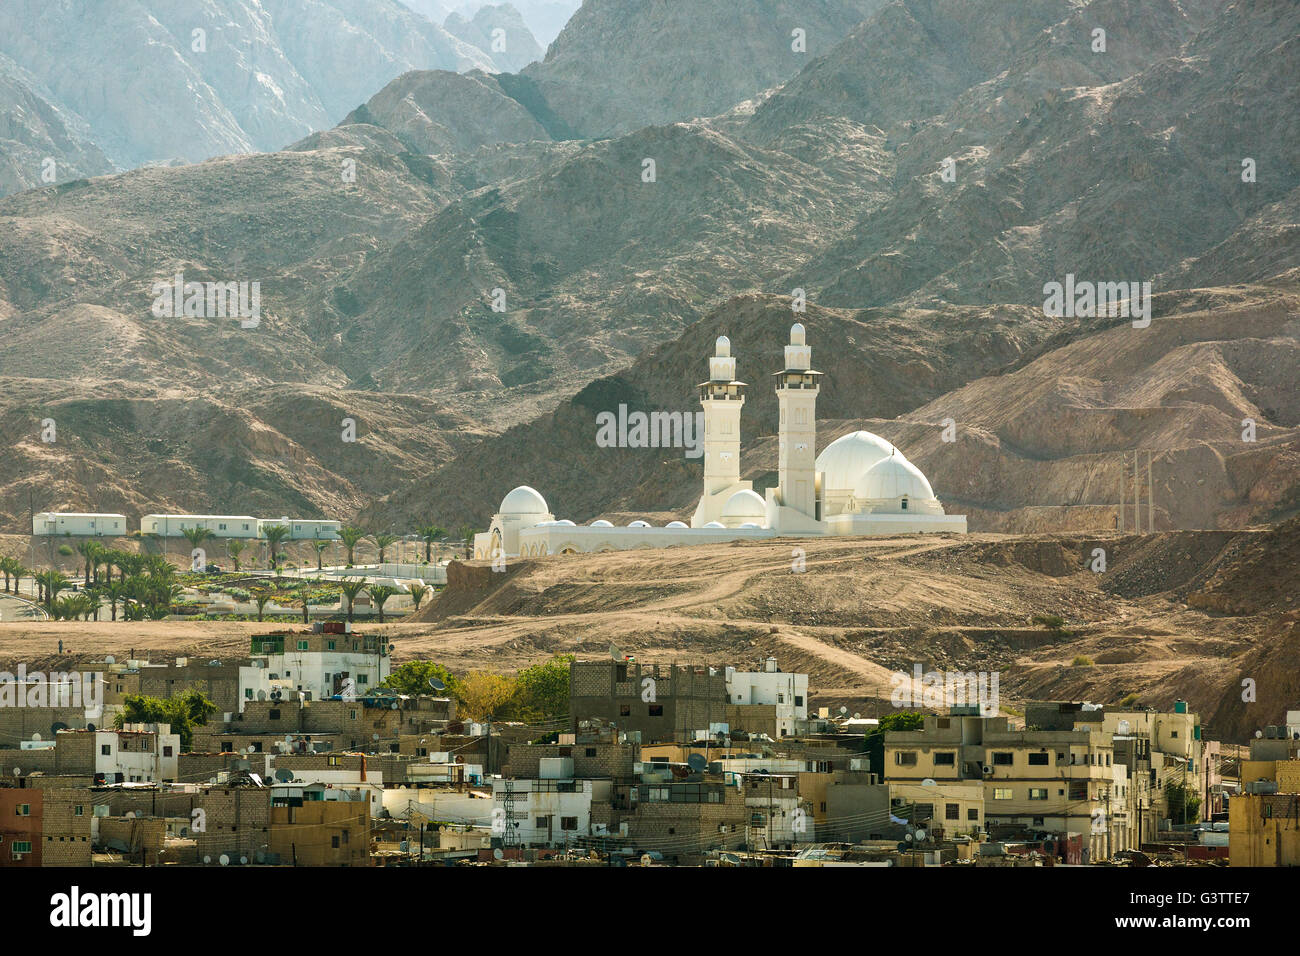 Jordan - the Al-Sharif Al-Hussein bin Al Mosque - Stock Image